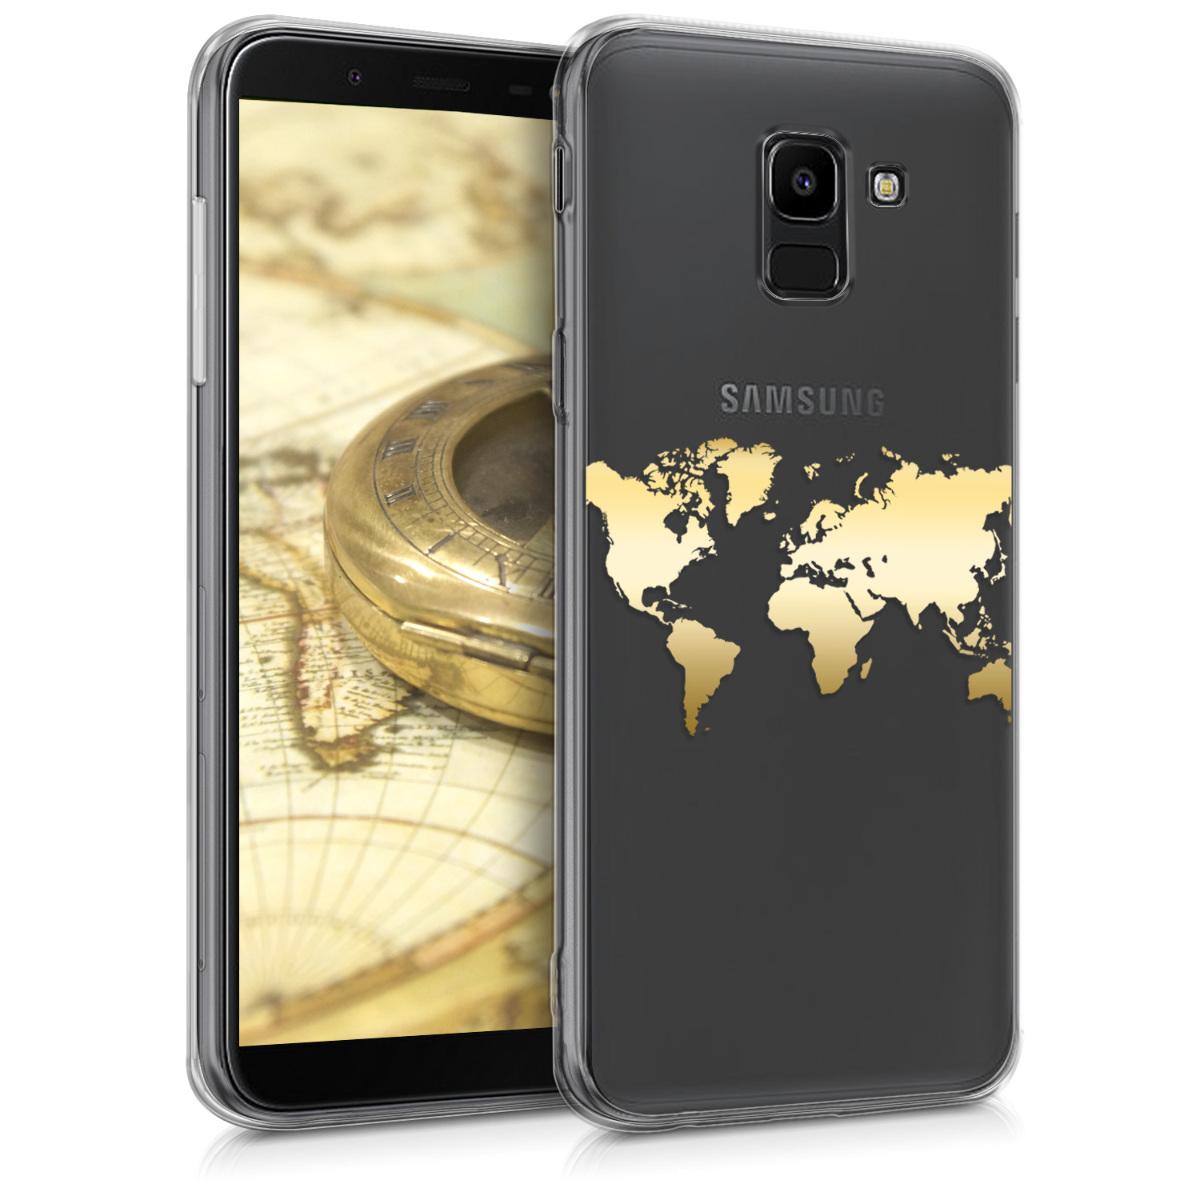 KW Θήκη Σιλικόνης Samsung Galaxy J6 - Gold / Transparent (45800.03)